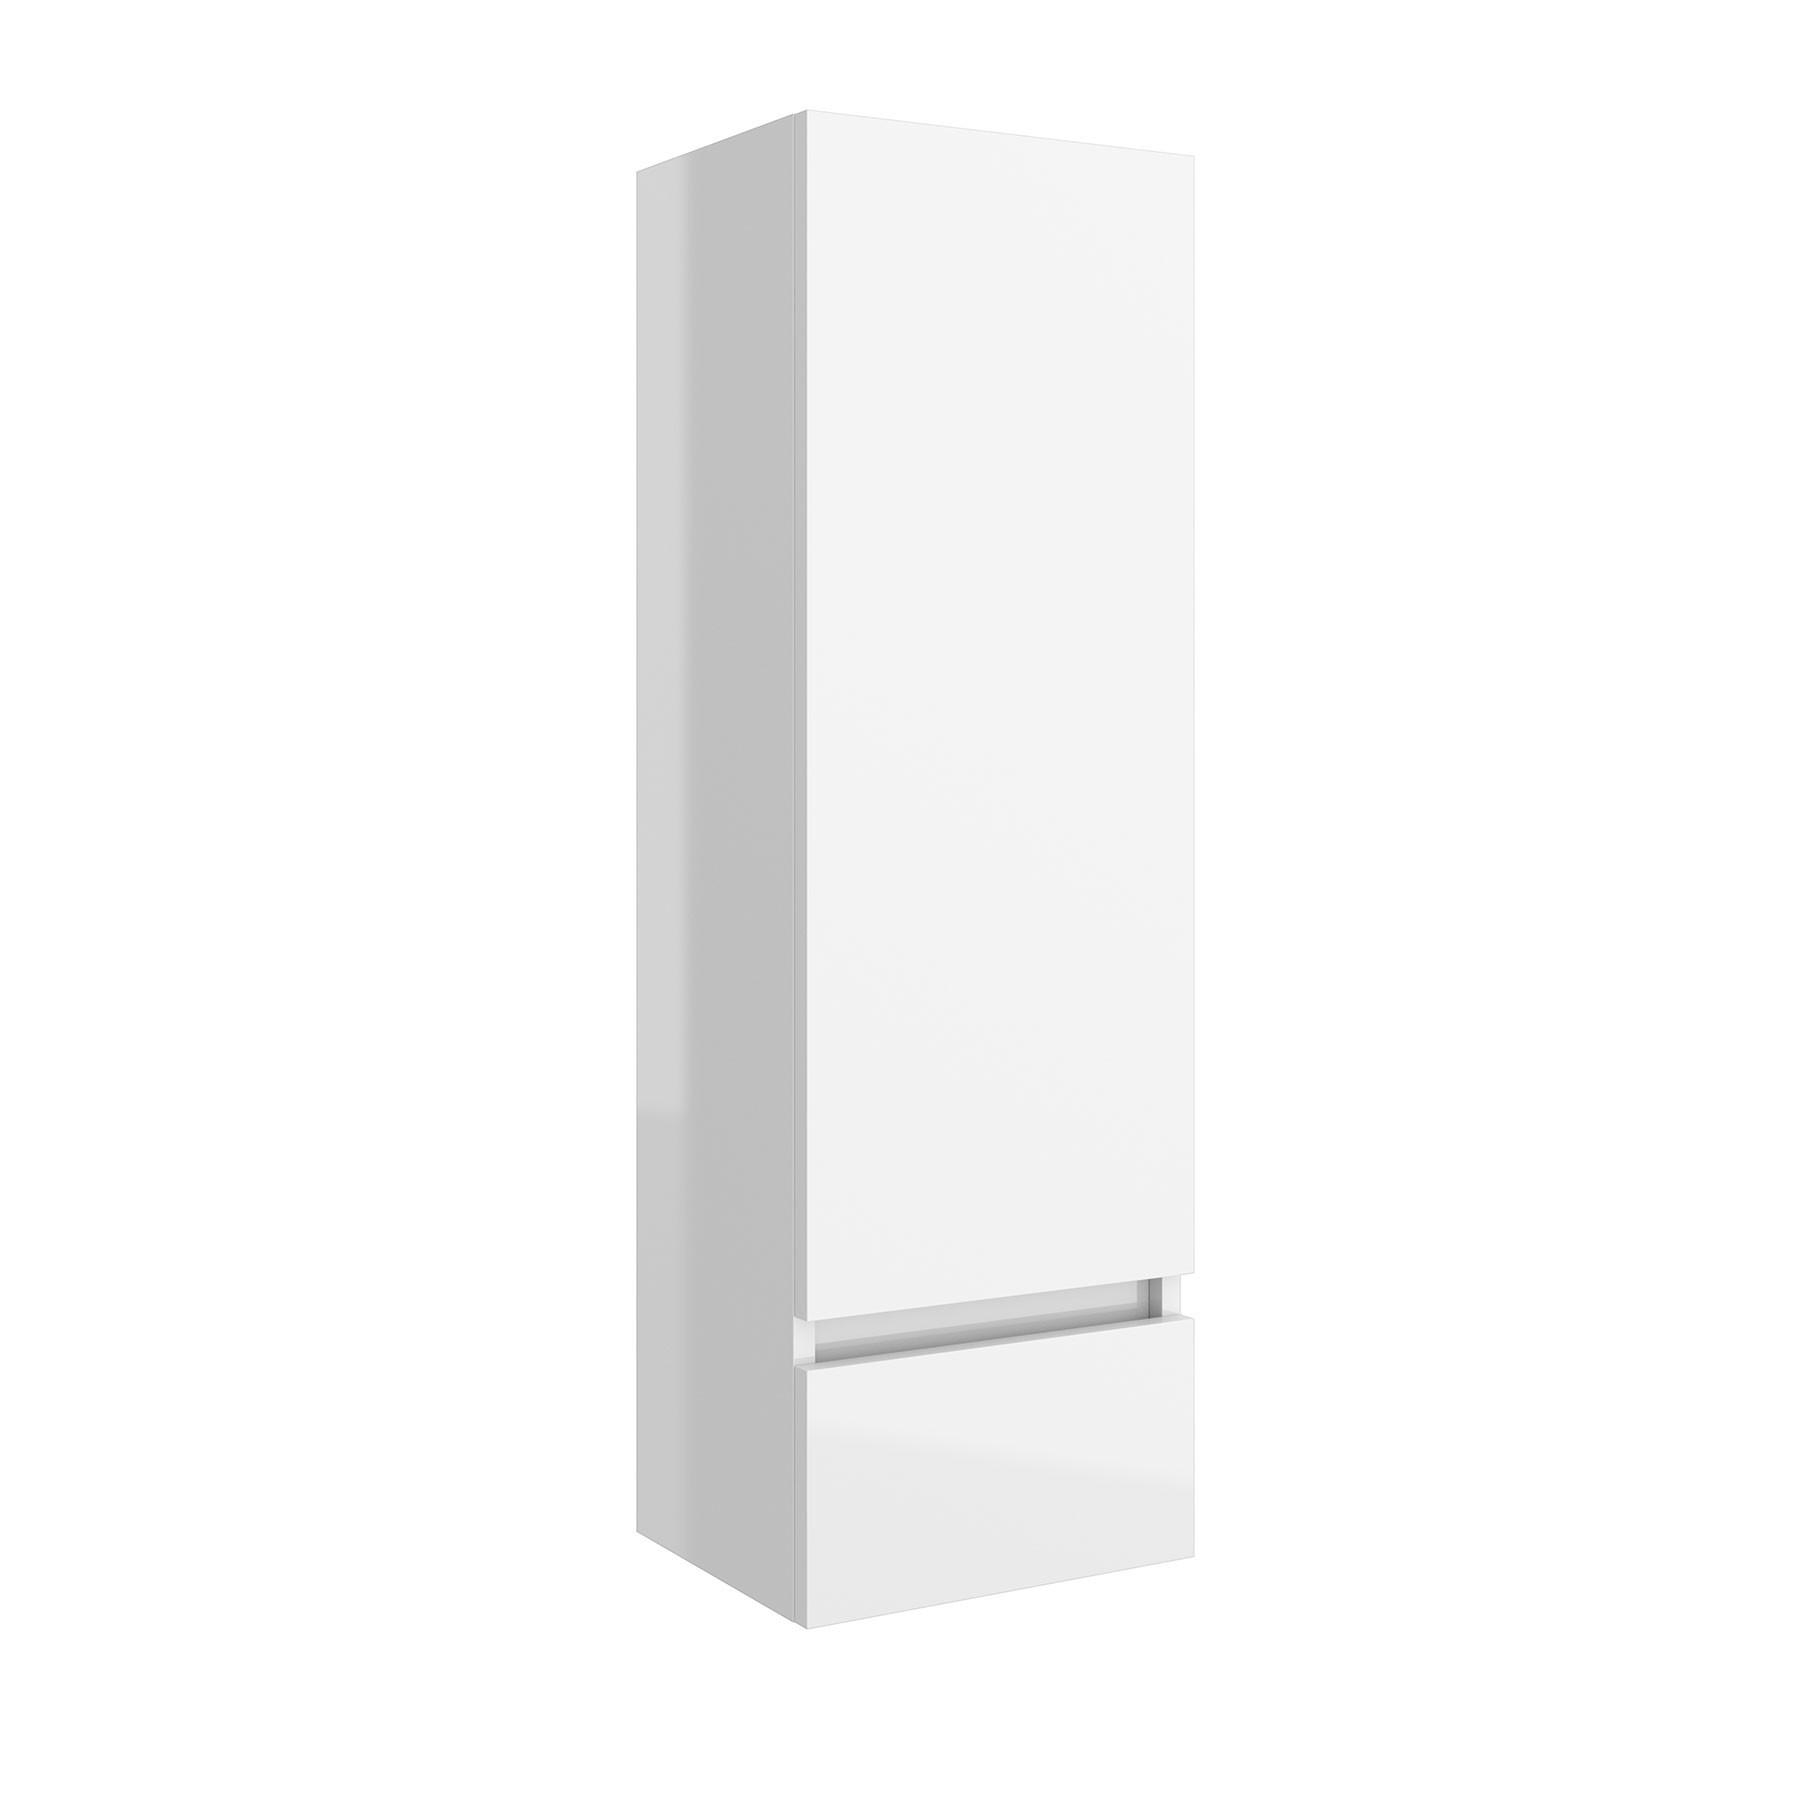 Columna Almagro Blanca 94x36x24